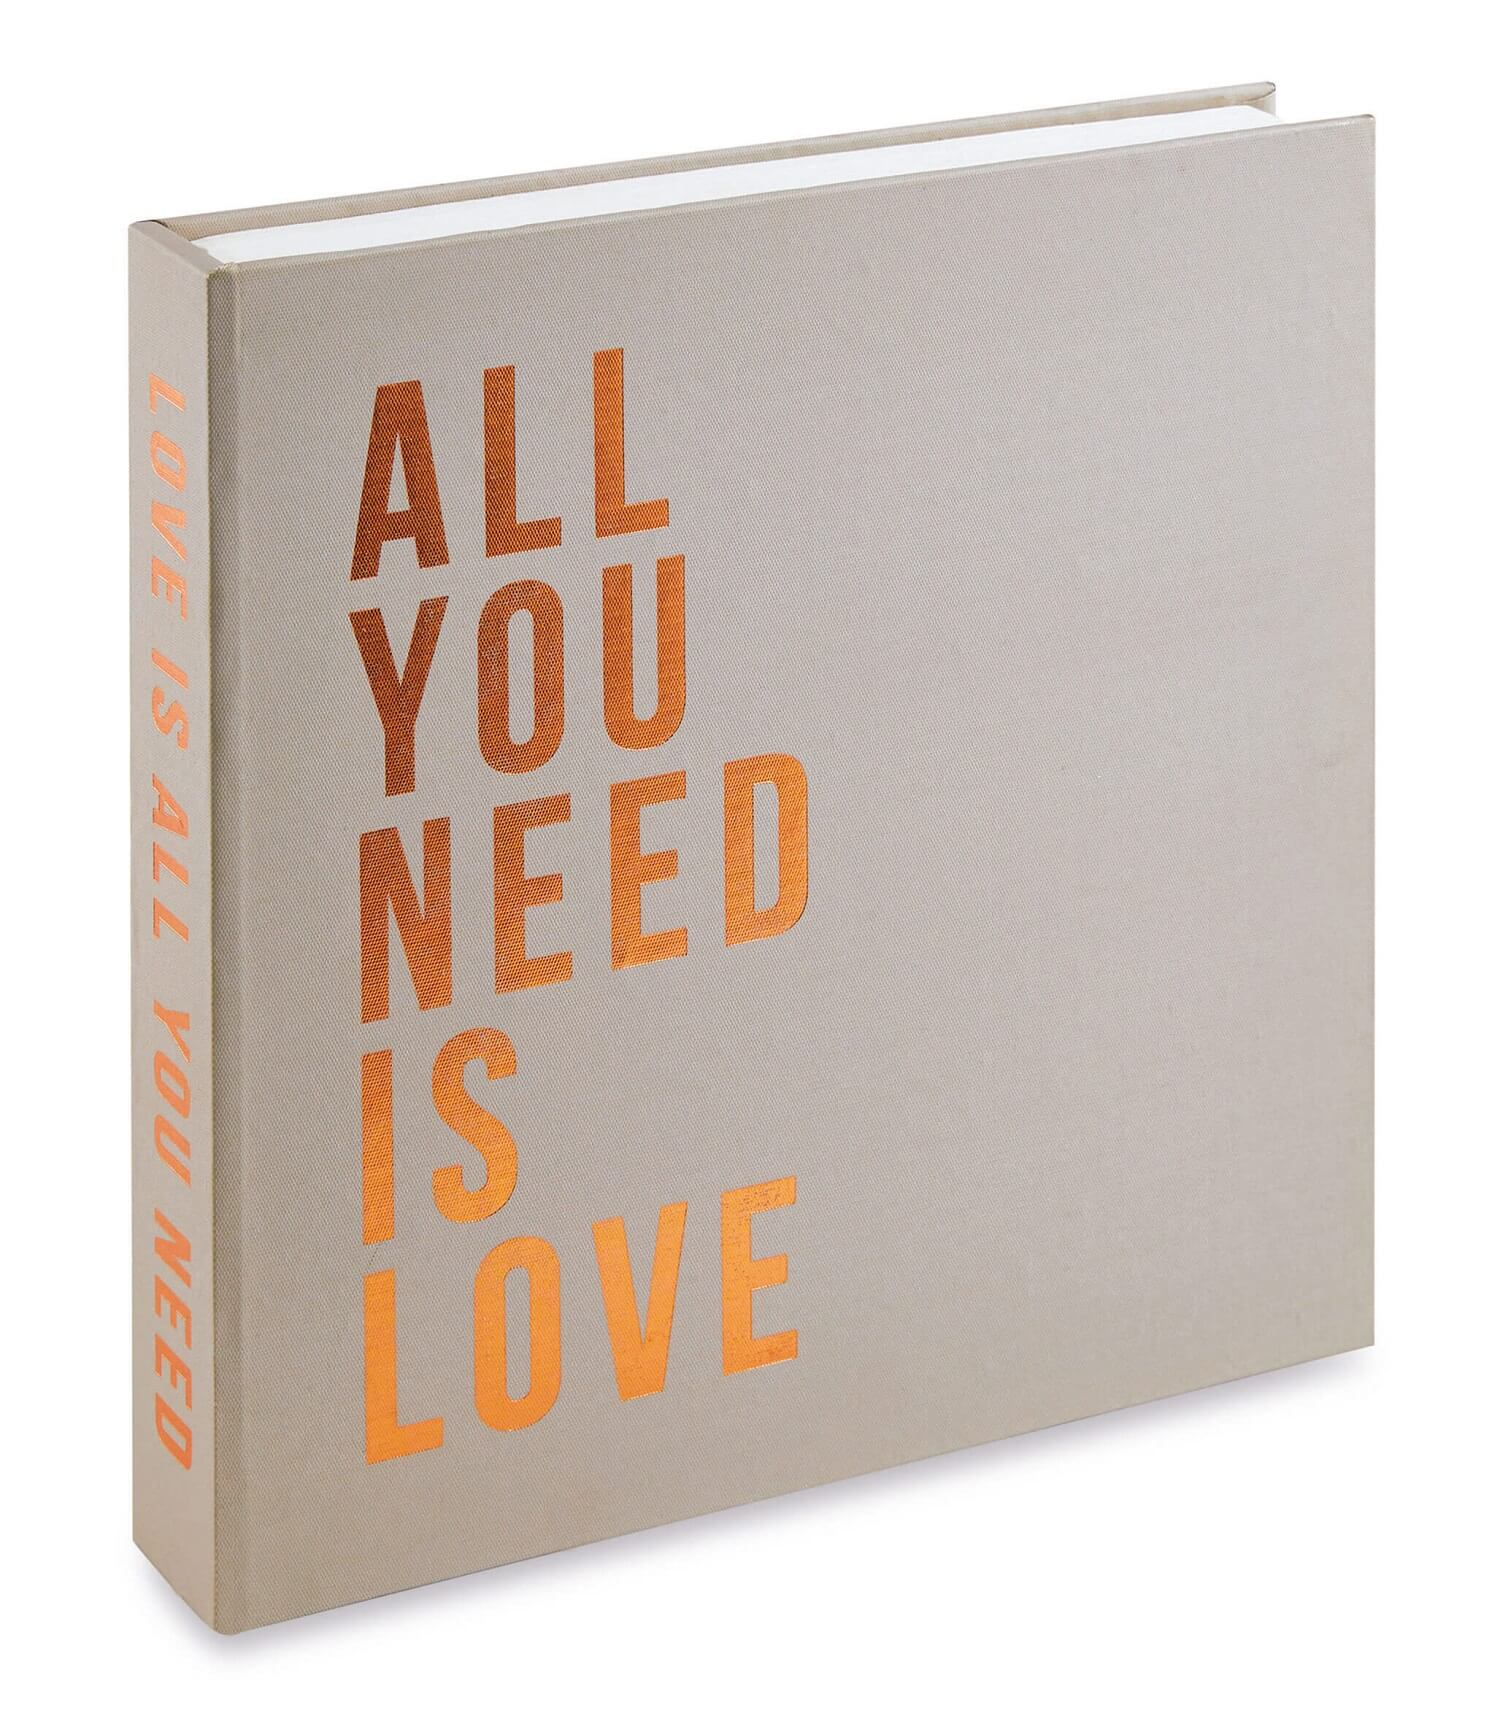 Caixa Livro Decorativo All You Need Is Love